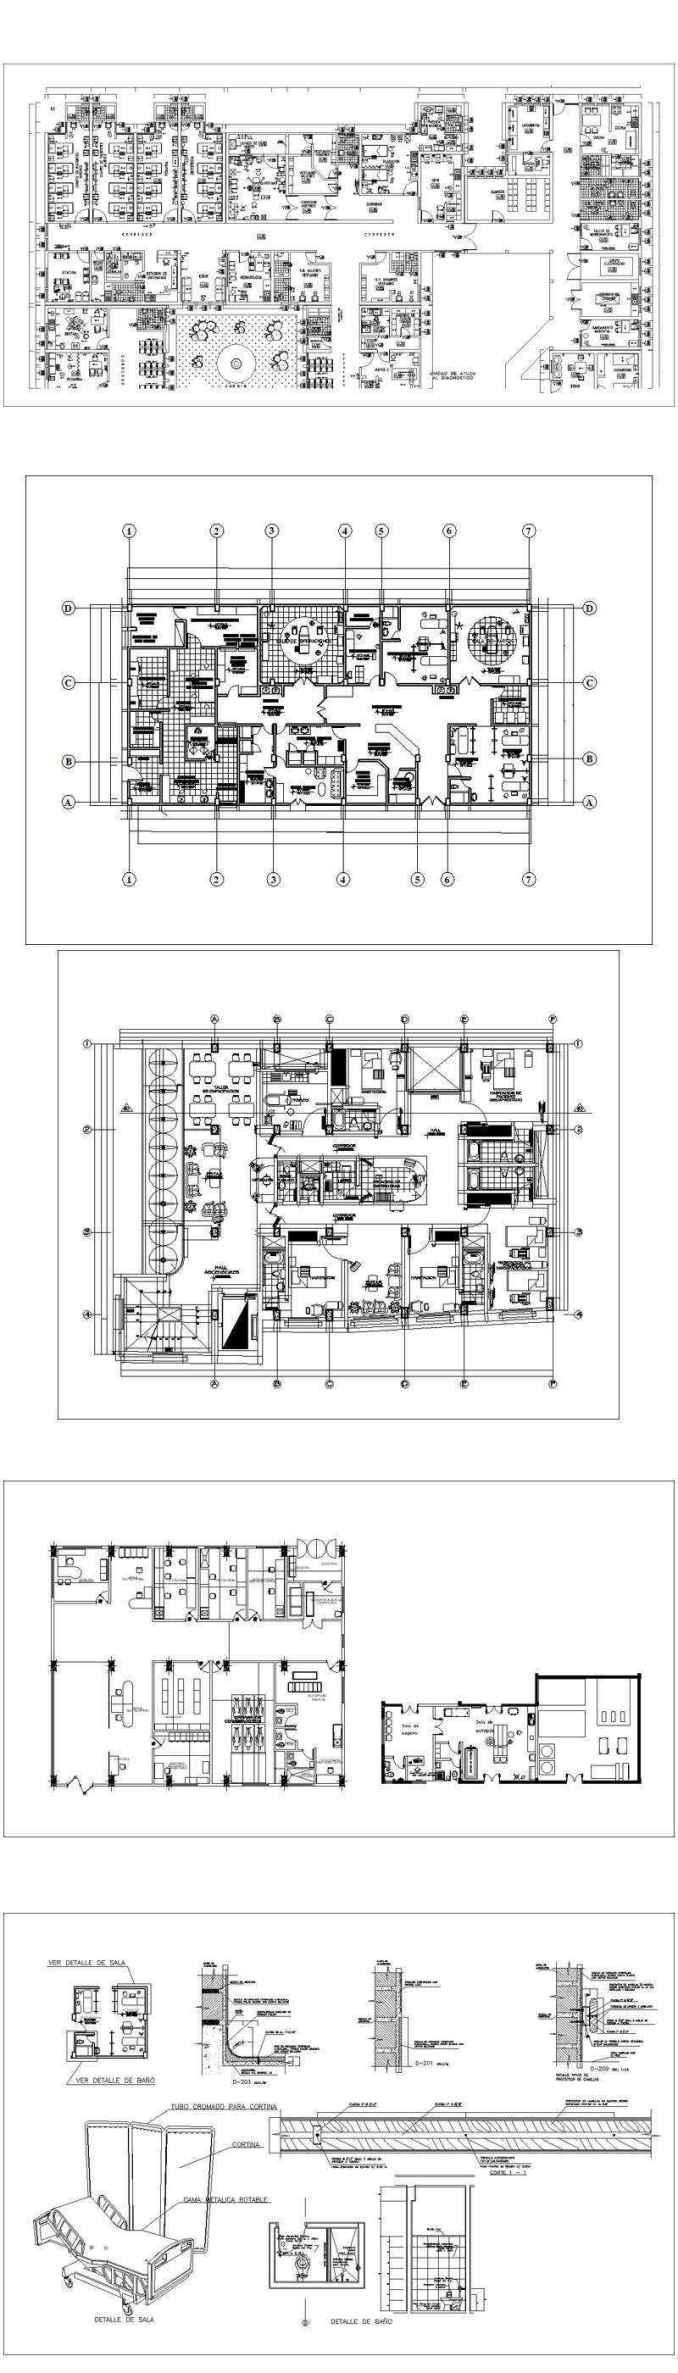 ★【Auditorium ,Cinema, Theaters CAD Blocks-Stage Equipment CAD Blocks】@Cinema Design,Autocad Blocks,Cinema Details,Cinema Section,Cinema elevation design drawings